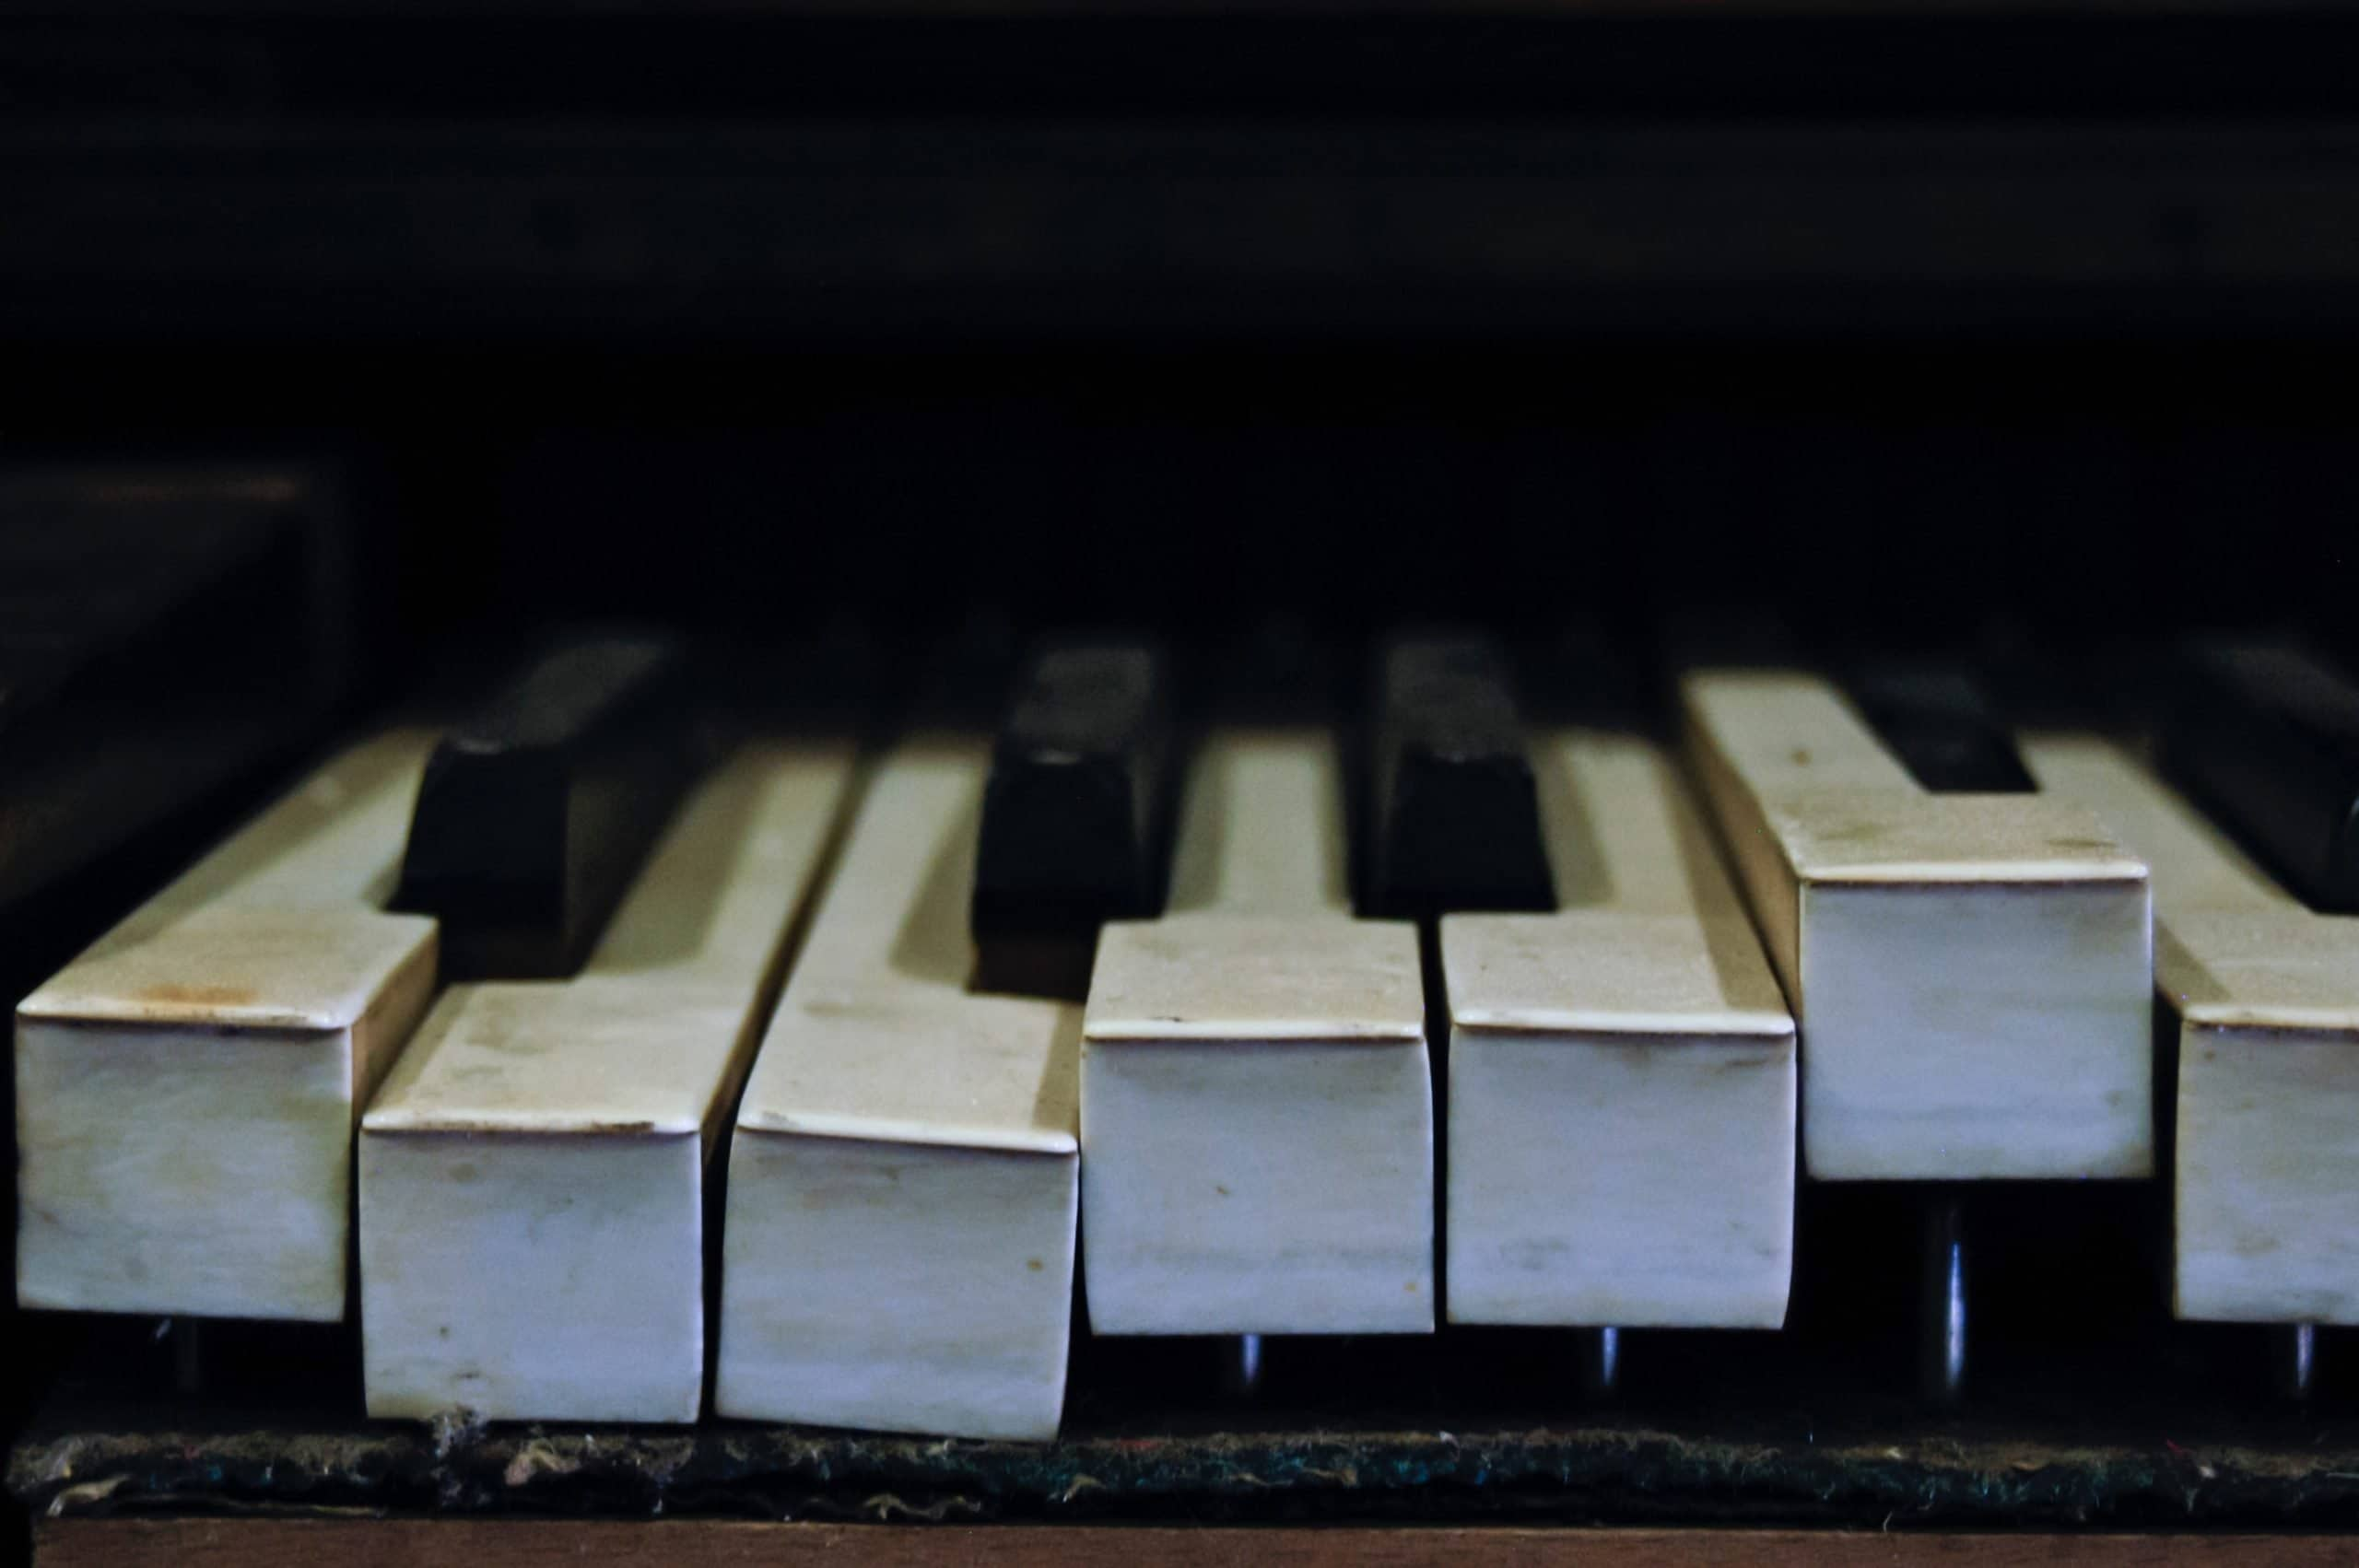 Broken piano keys | Check out my blog: matthewtrader.com/unsplash